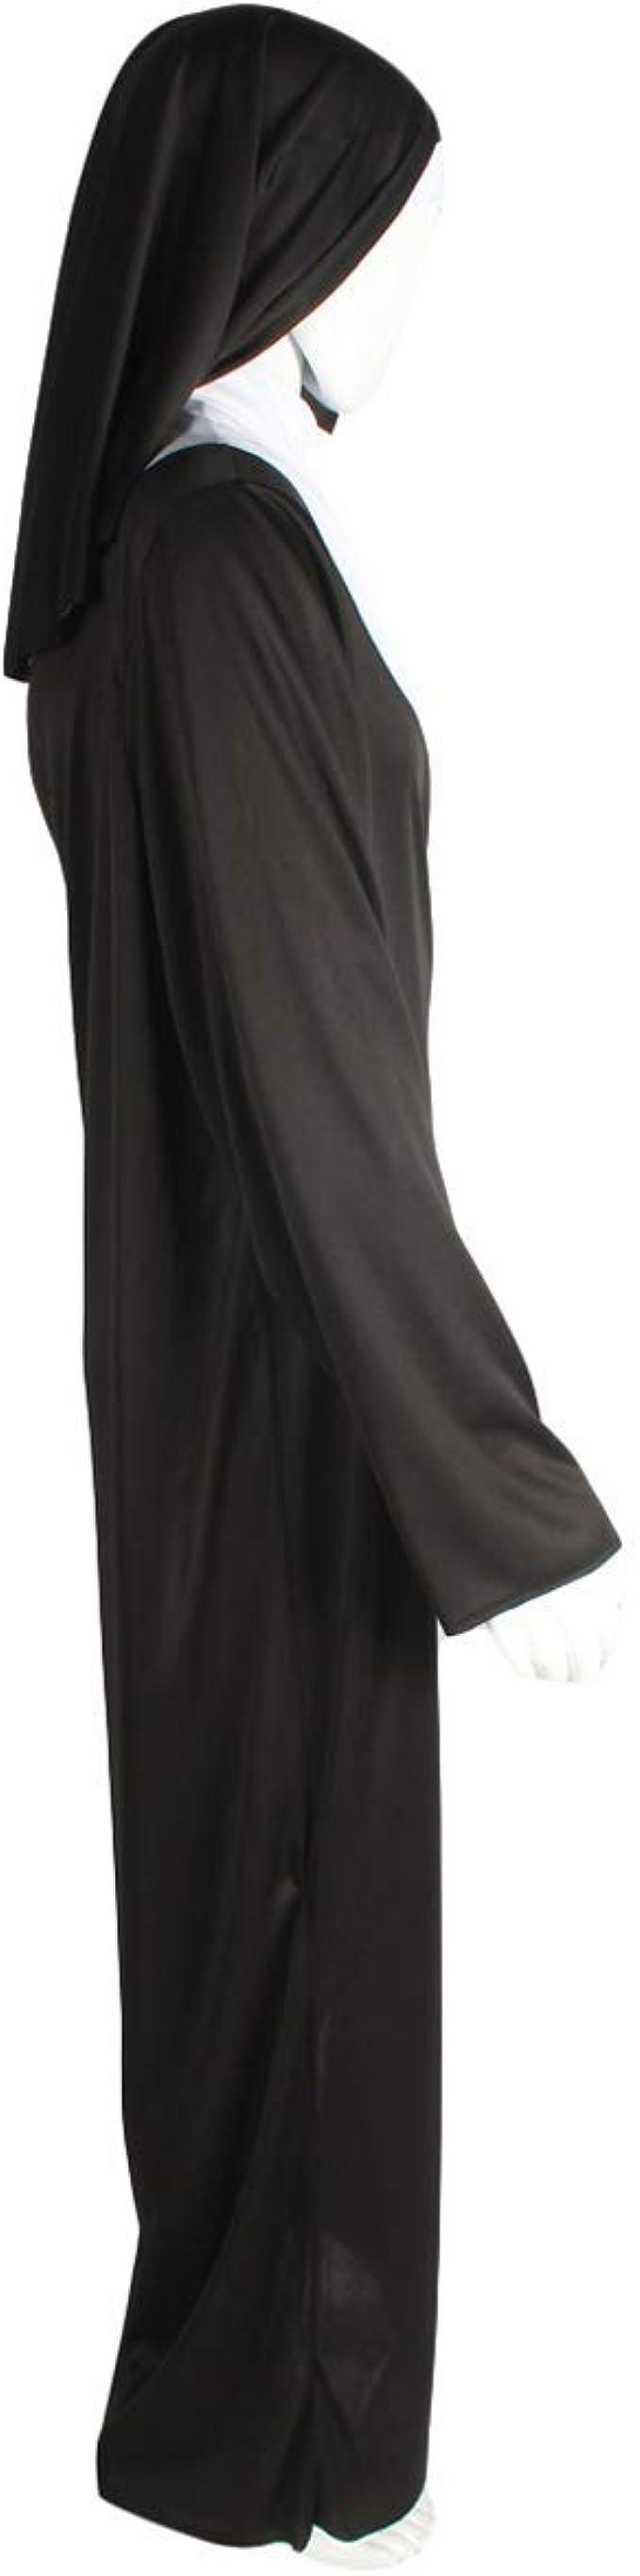 Adult Men Nun Outfit Costume Multi Color HC-1472